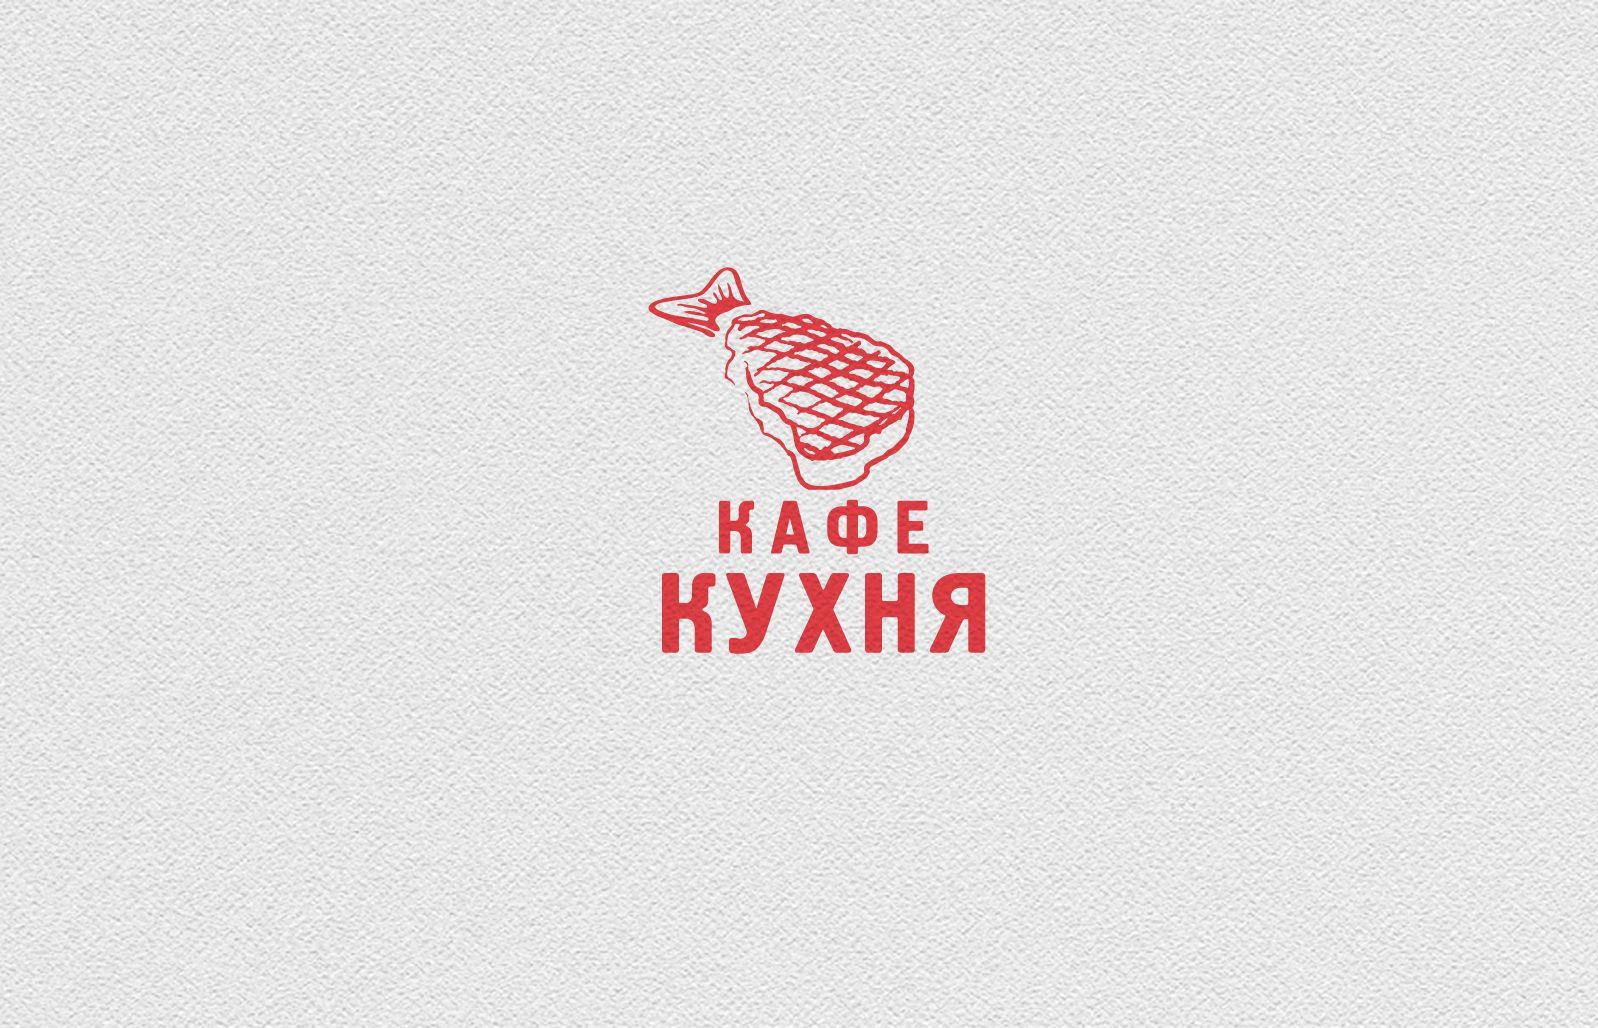 Логотип для кафе КУХНЯ - дизайнер andblin61